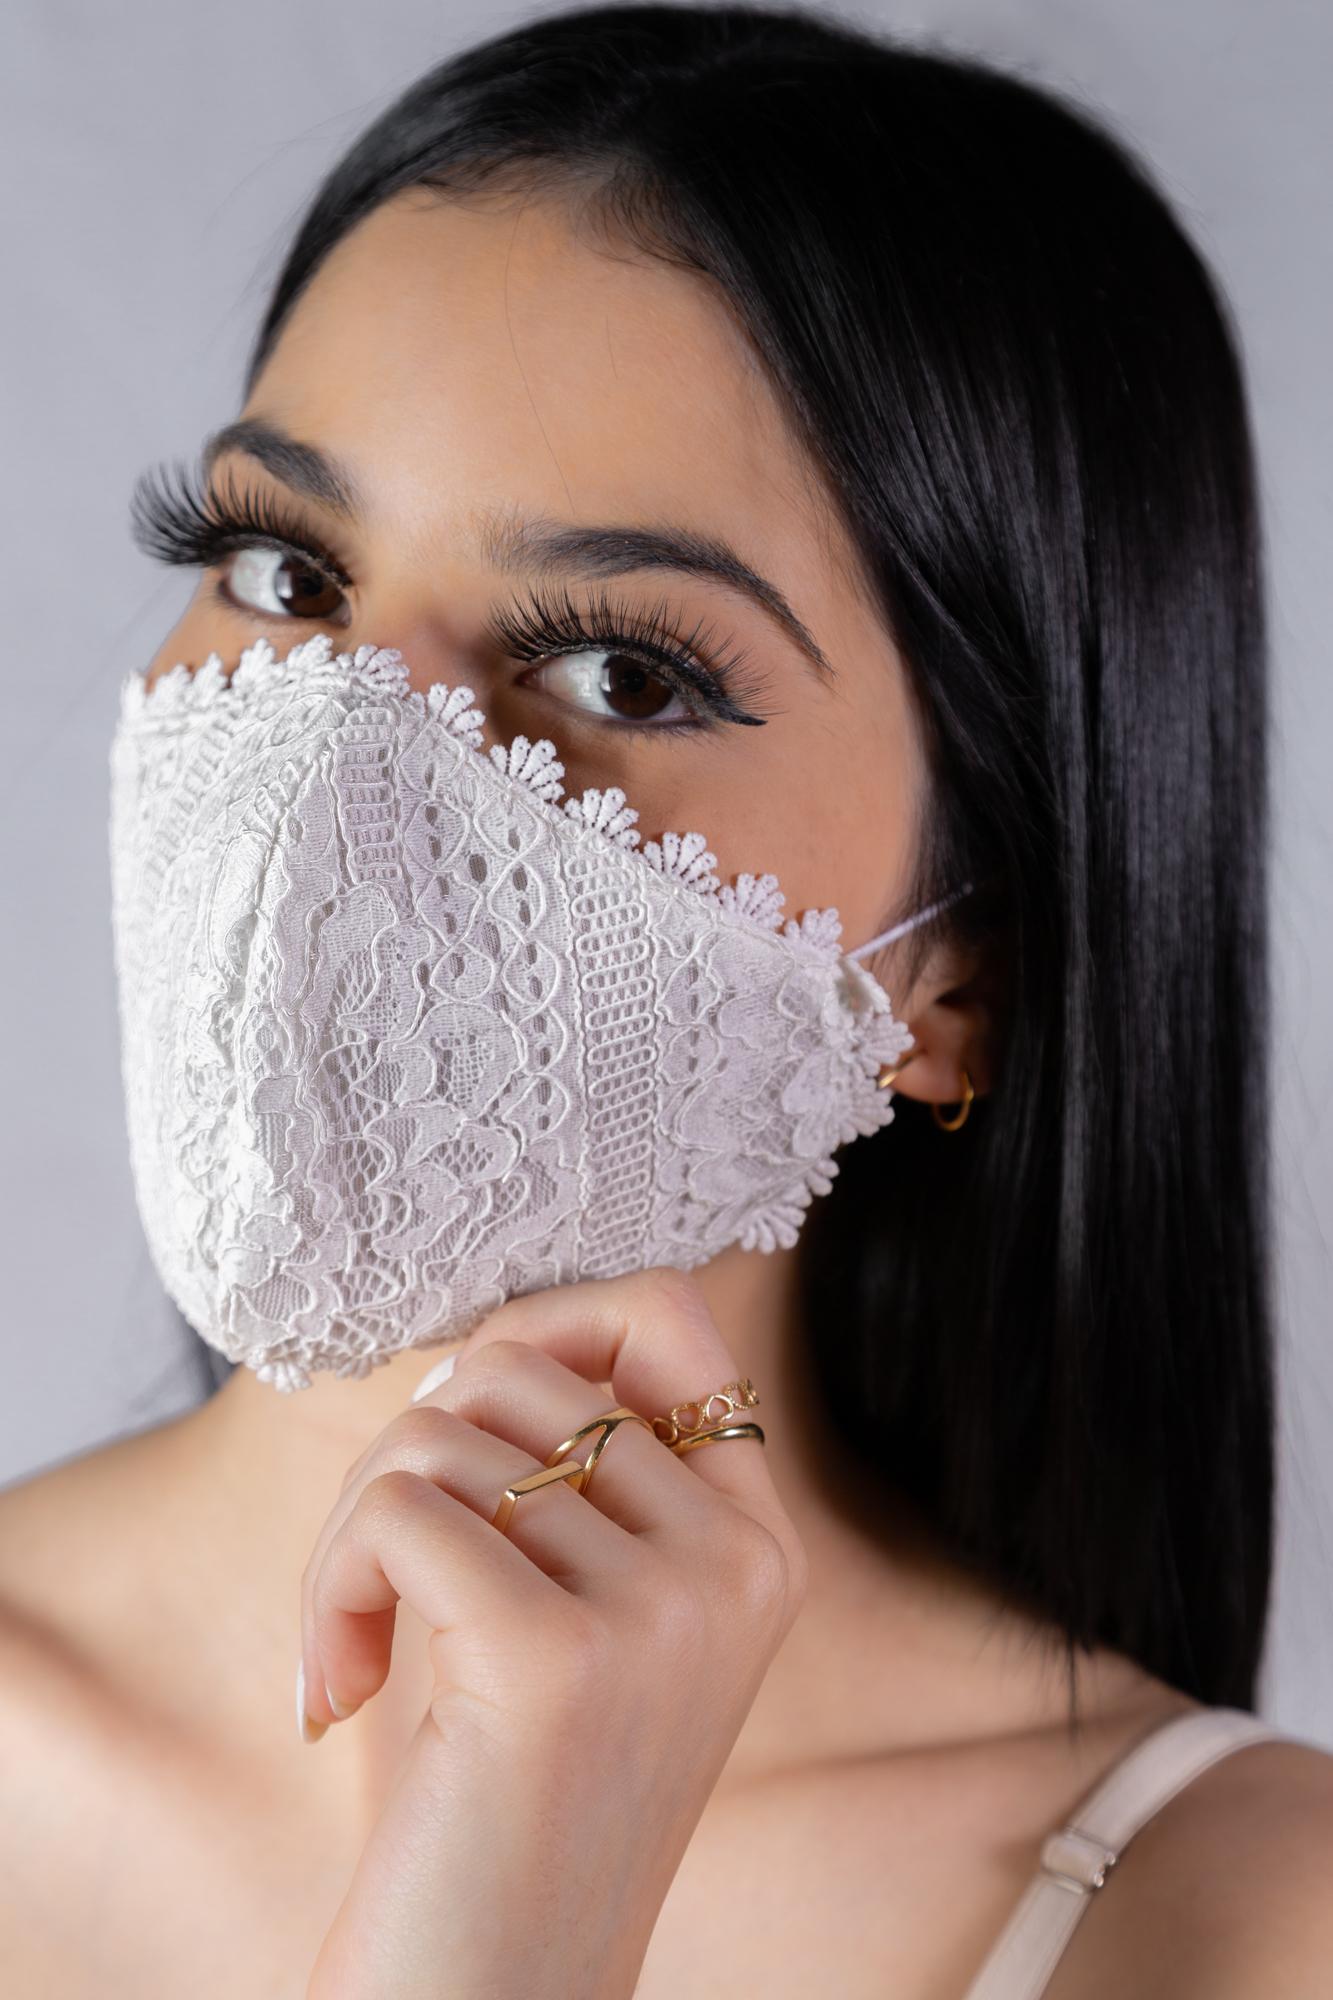 Máscara branca furtacor - Atelier Fernanda Baião Alta Costura, Estilista Ubá e Juiz de Fora